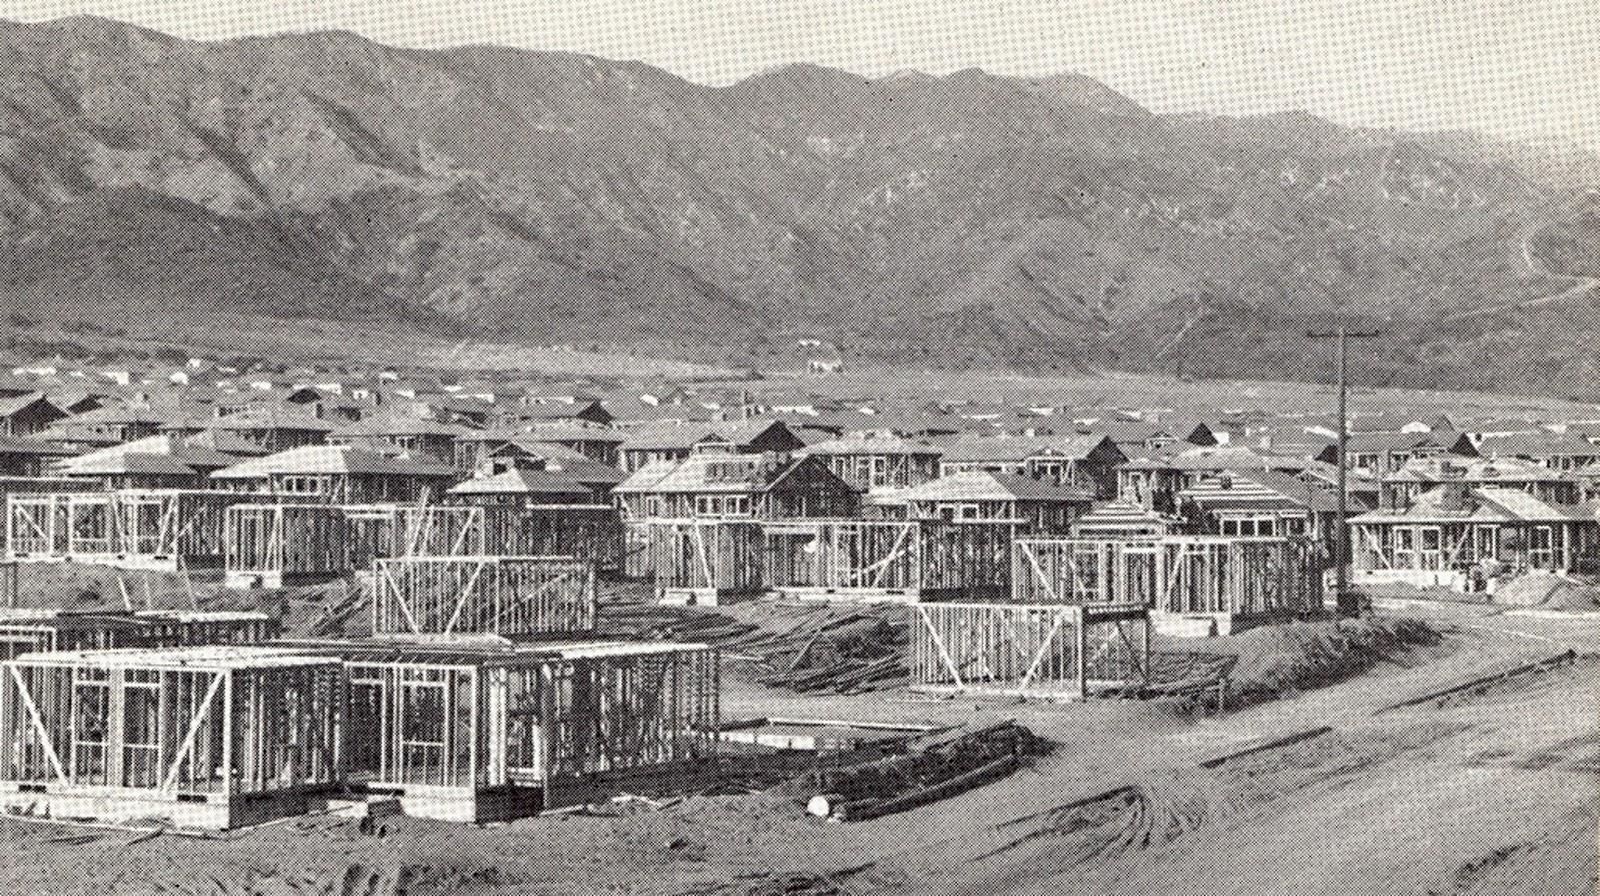 The Museum Of The San Fernando Valley Burbank Typifies